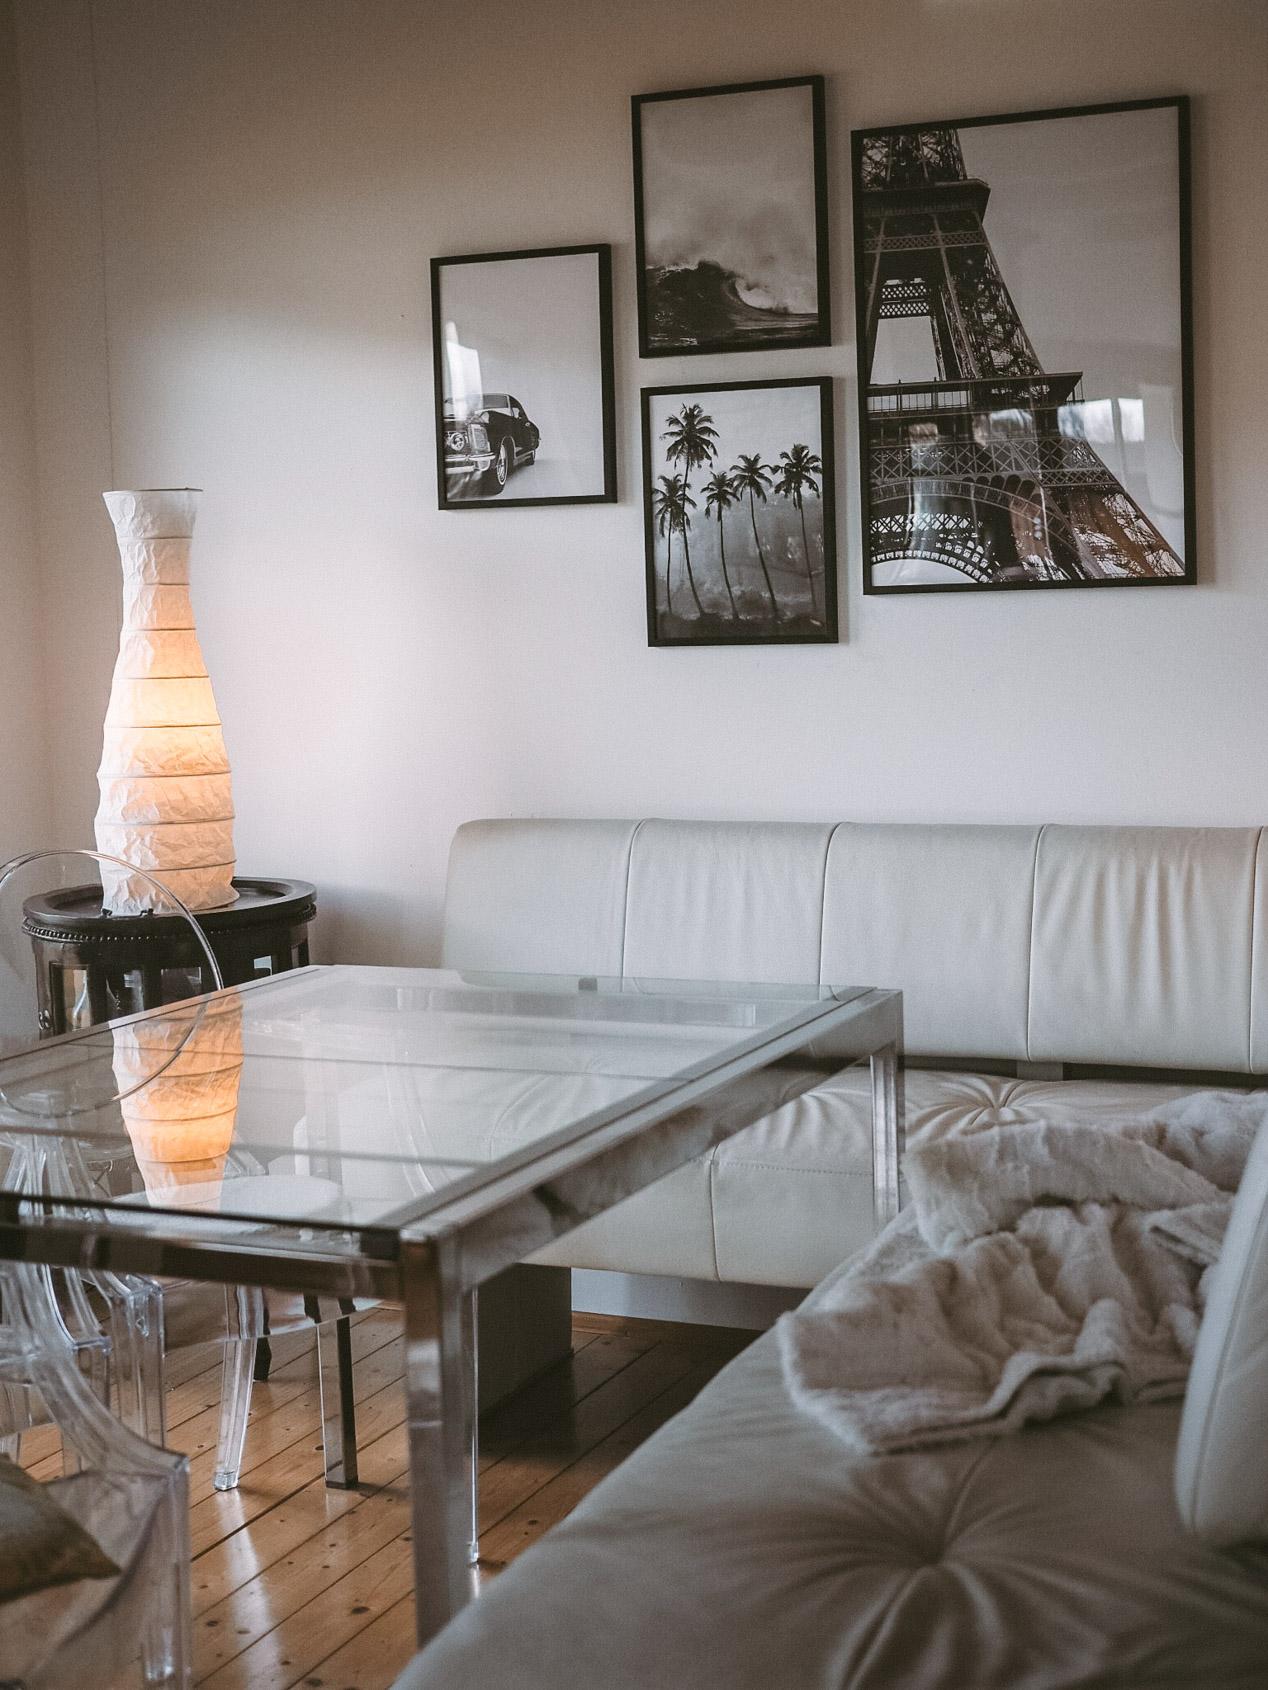 Homesweethome, Bilderwand, Inspiration für zu Hause, posterwand, Bildwand, Desenio, www.lakatyfox.com